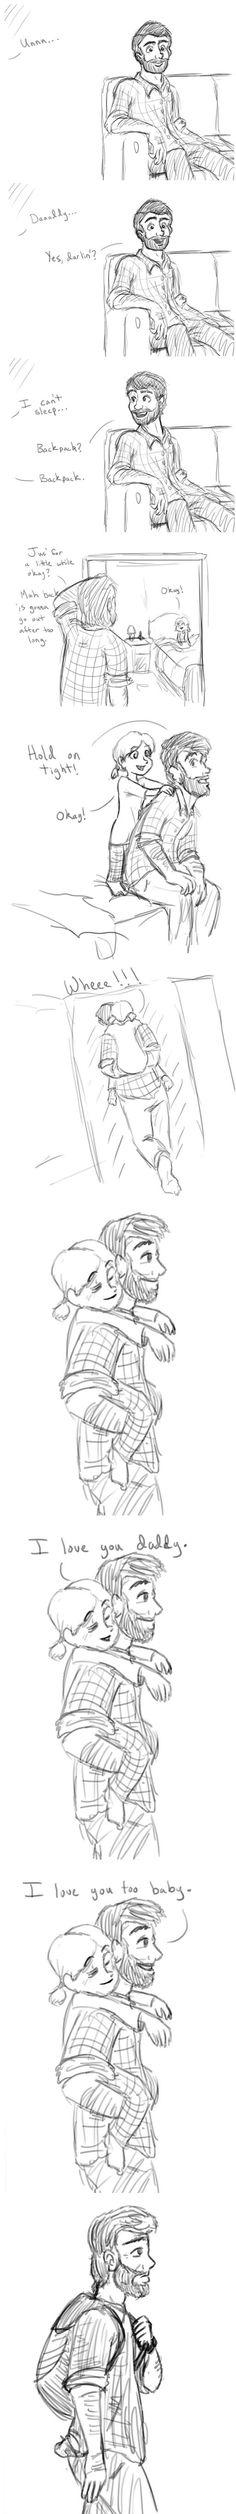 The Last of Us: Joel's Backpack :(